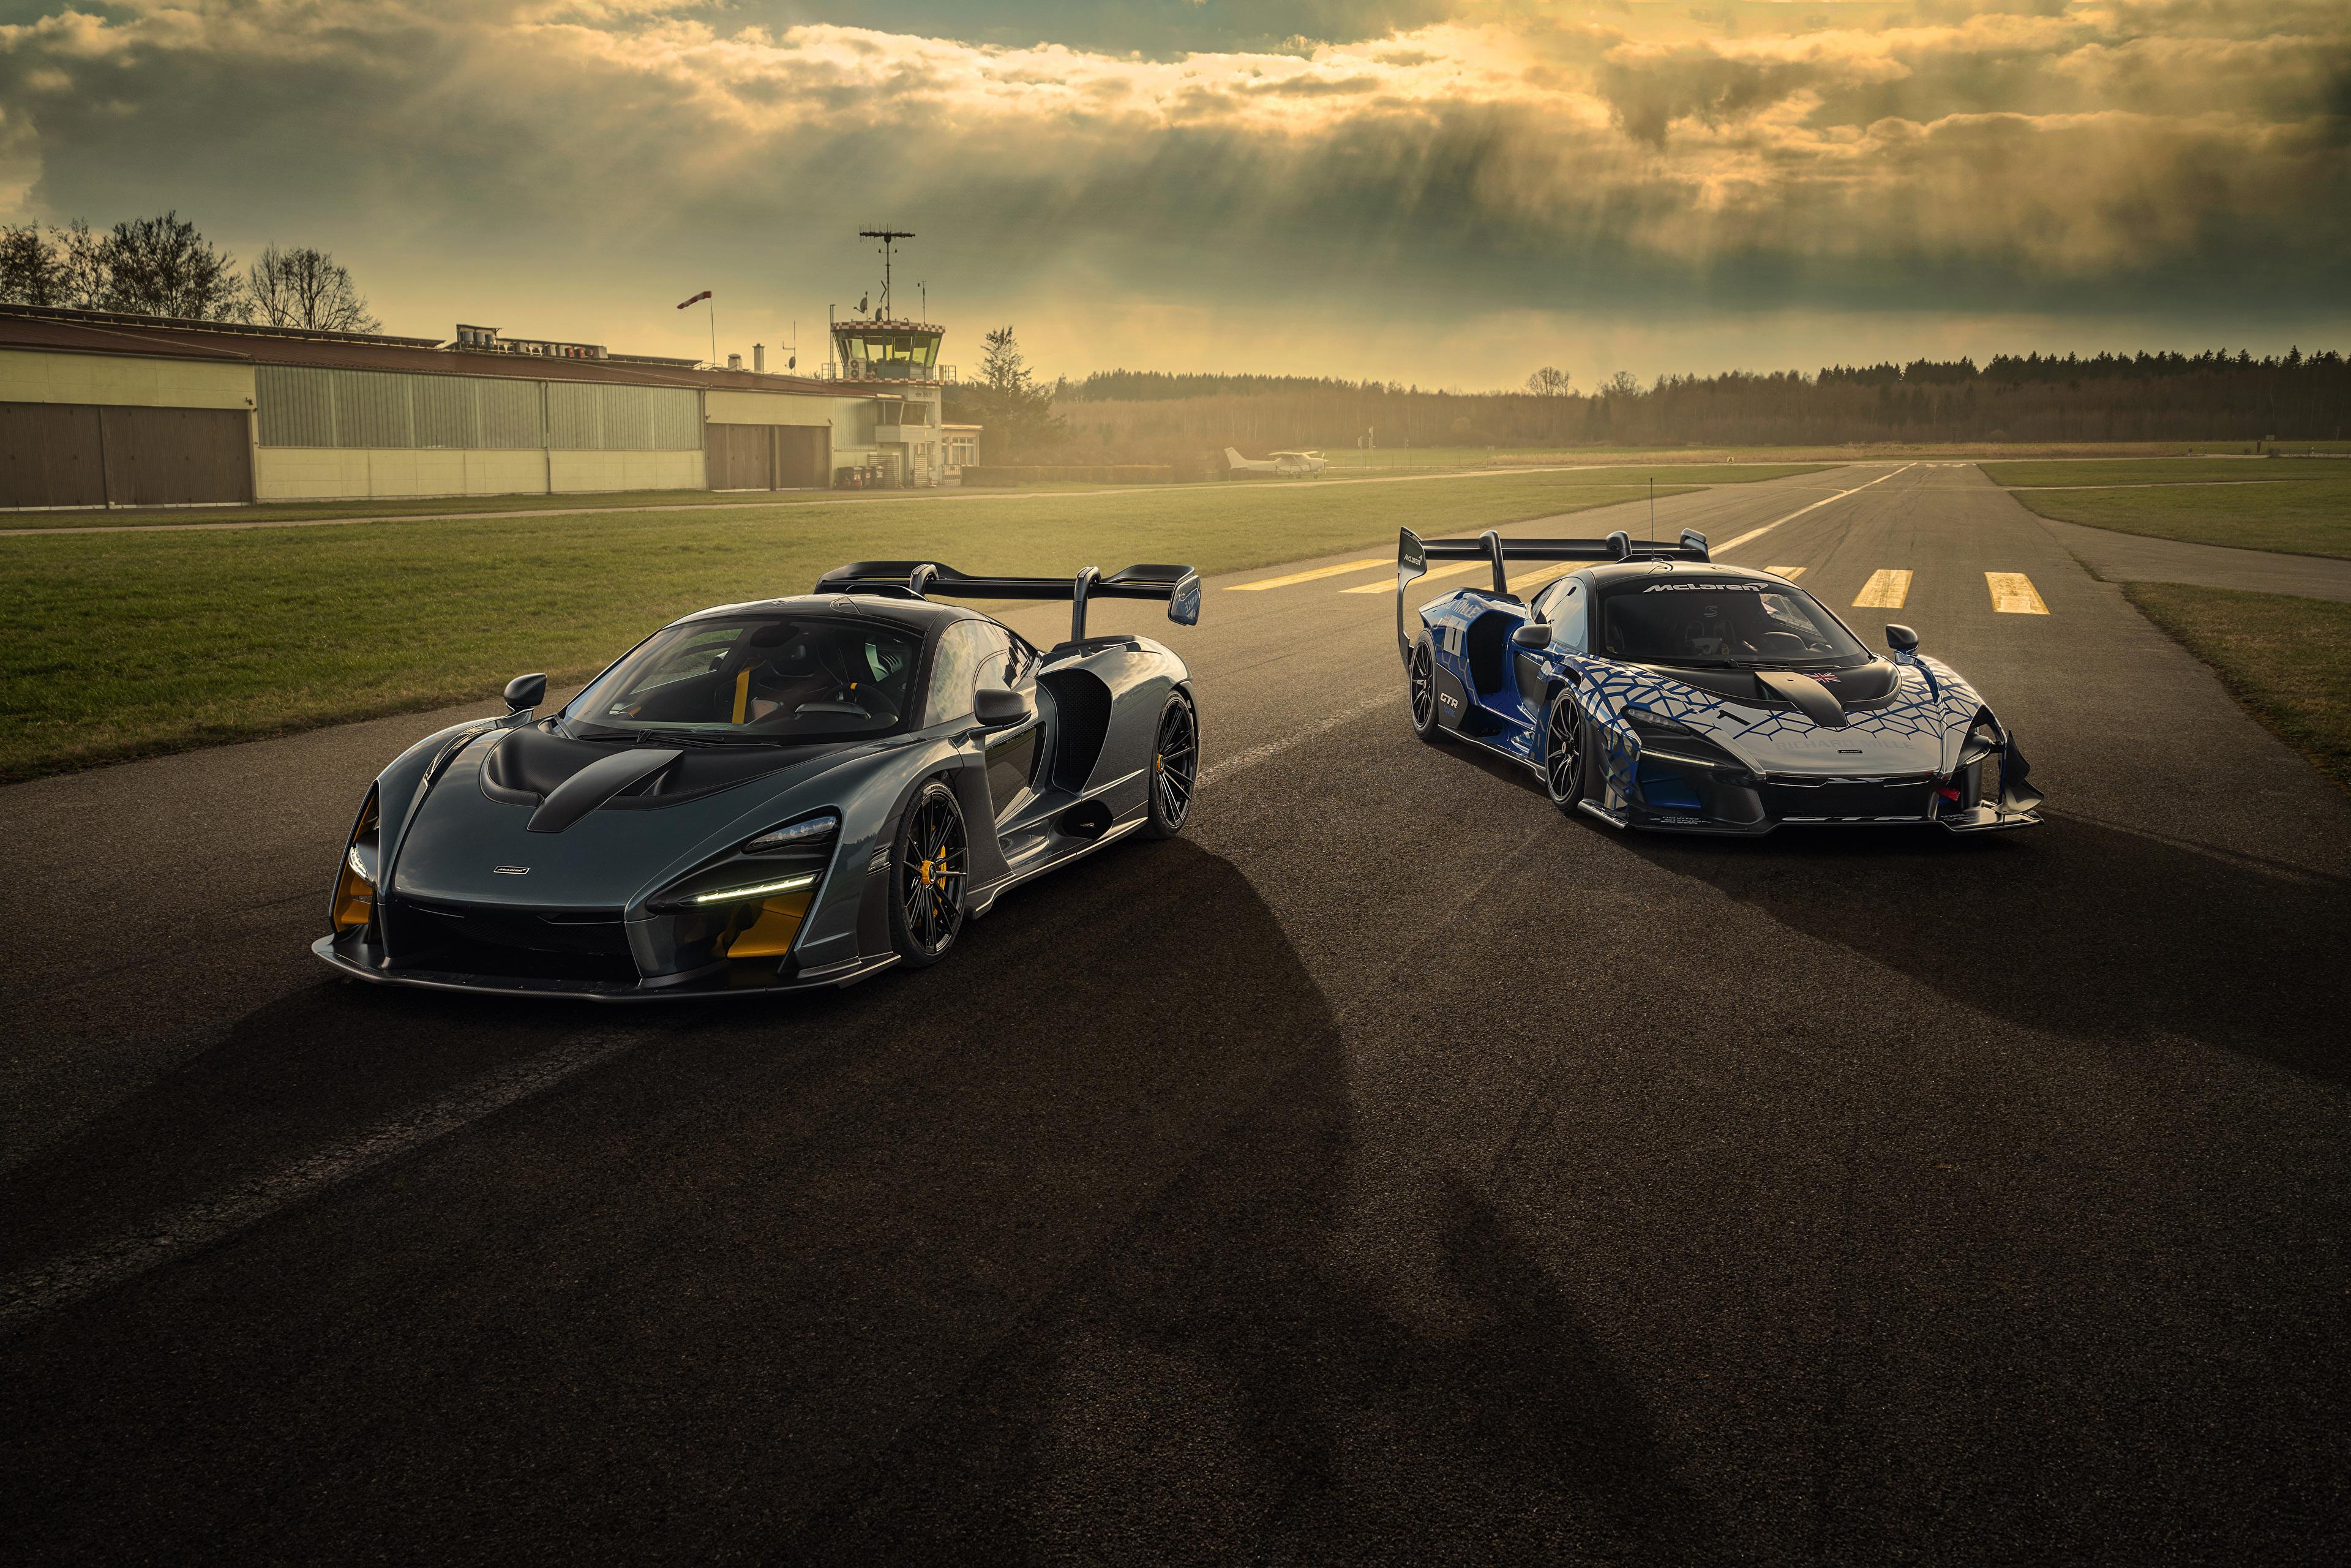 Picture 2020 Novitec McLaren Senna 2 Cars 3840x2561 Two auto automobile